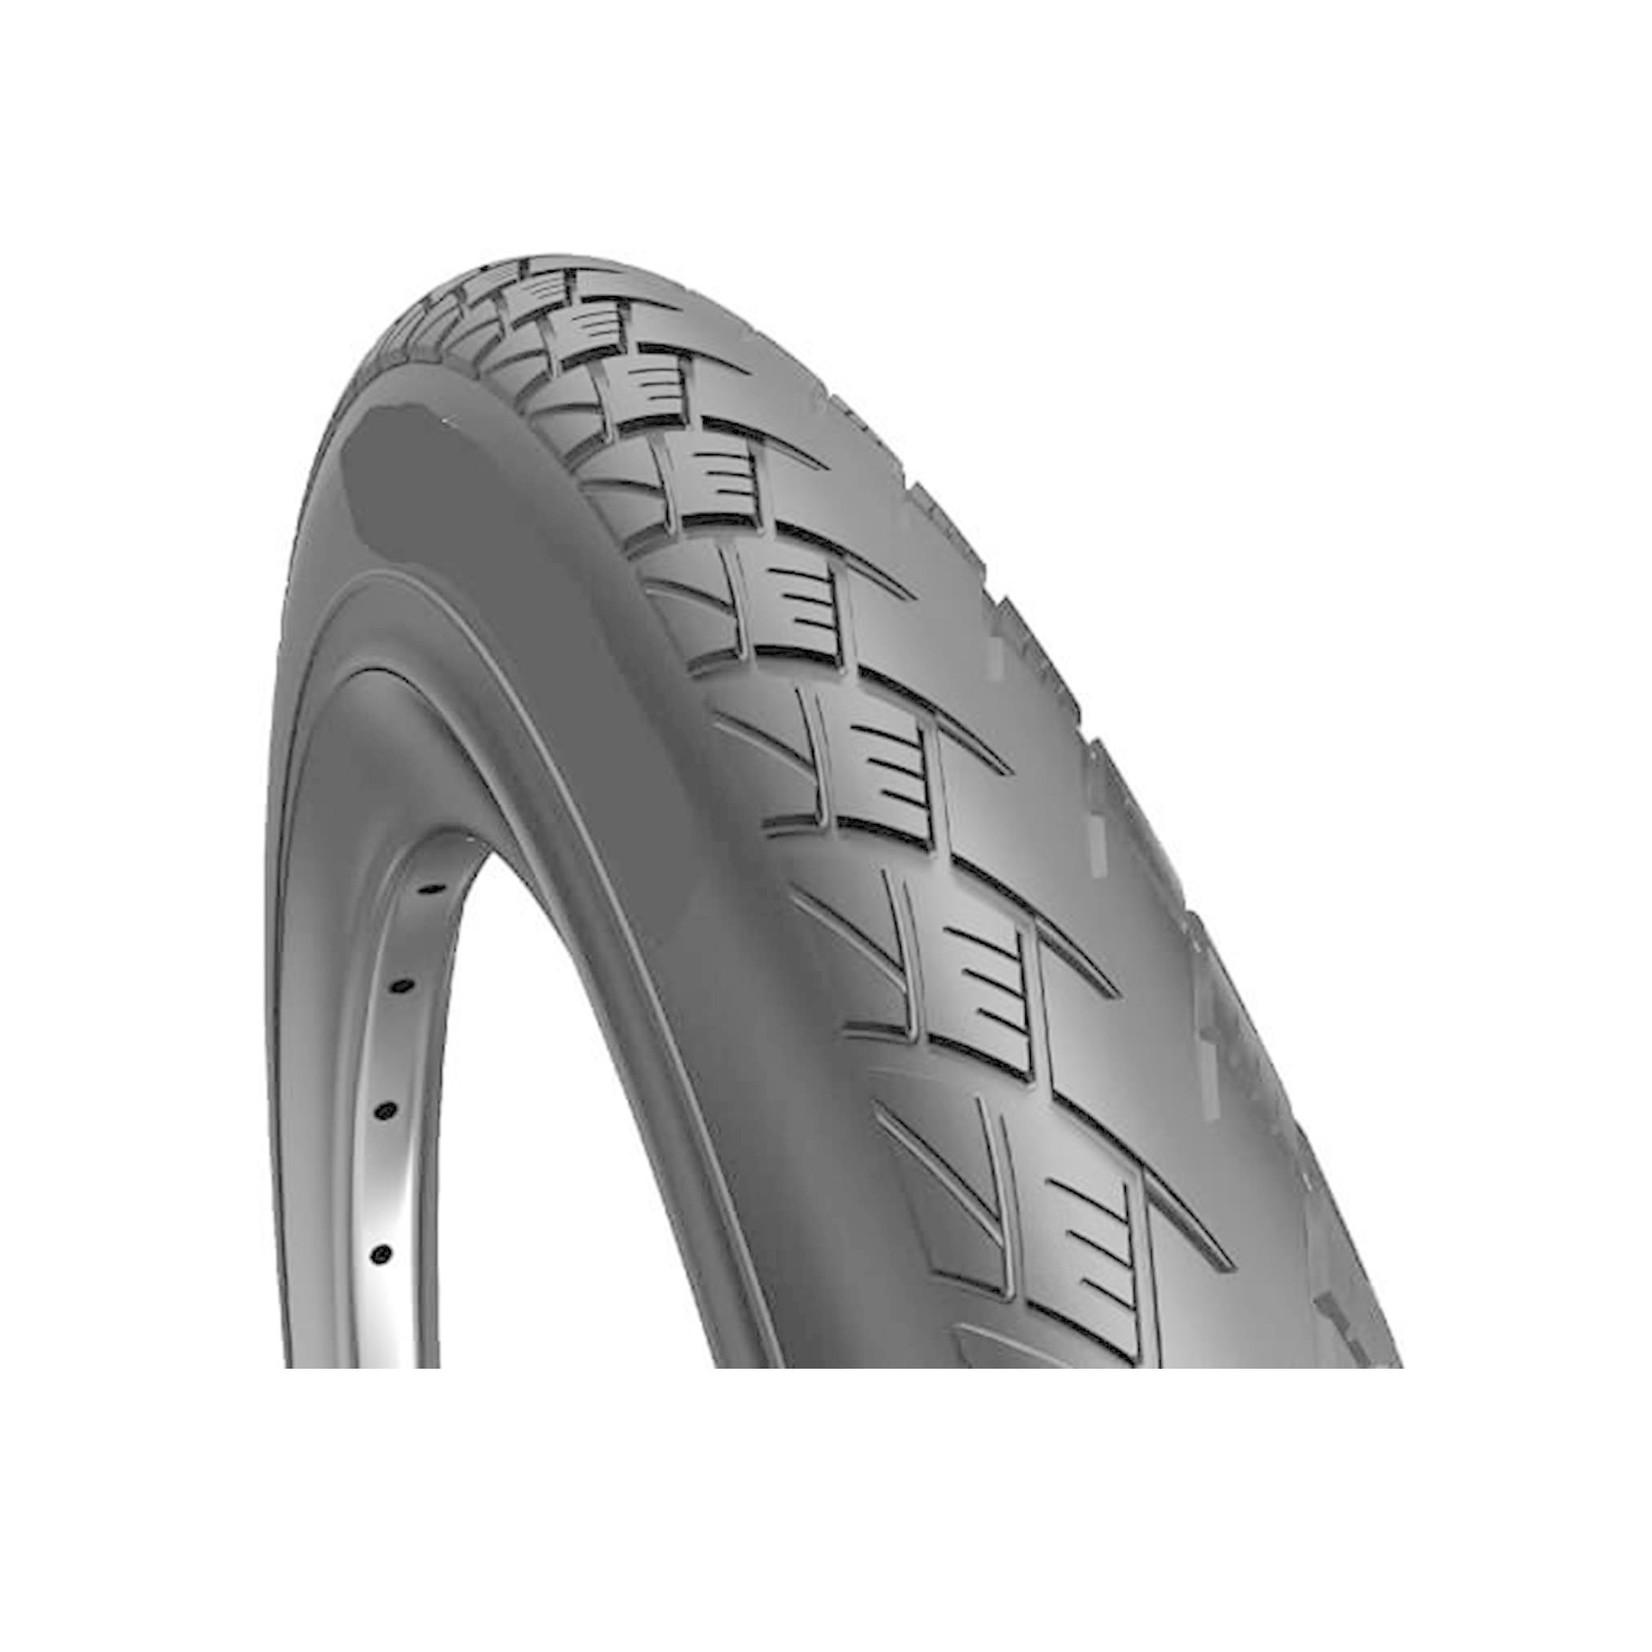 Rocket City Runner 700 X 35 PG Tyre